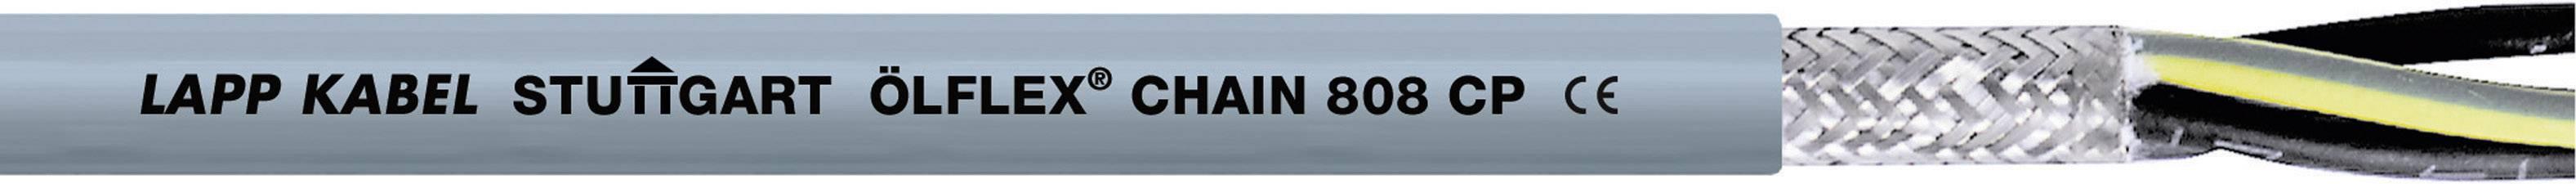 Žíla kabelu LappKabel ÖLFLEX CHAIN 808 CP 7G1,0 (1027771), 7x 1 mm², polyurethan, Ø 9,8 mm, stíněný, 1 m, šedá